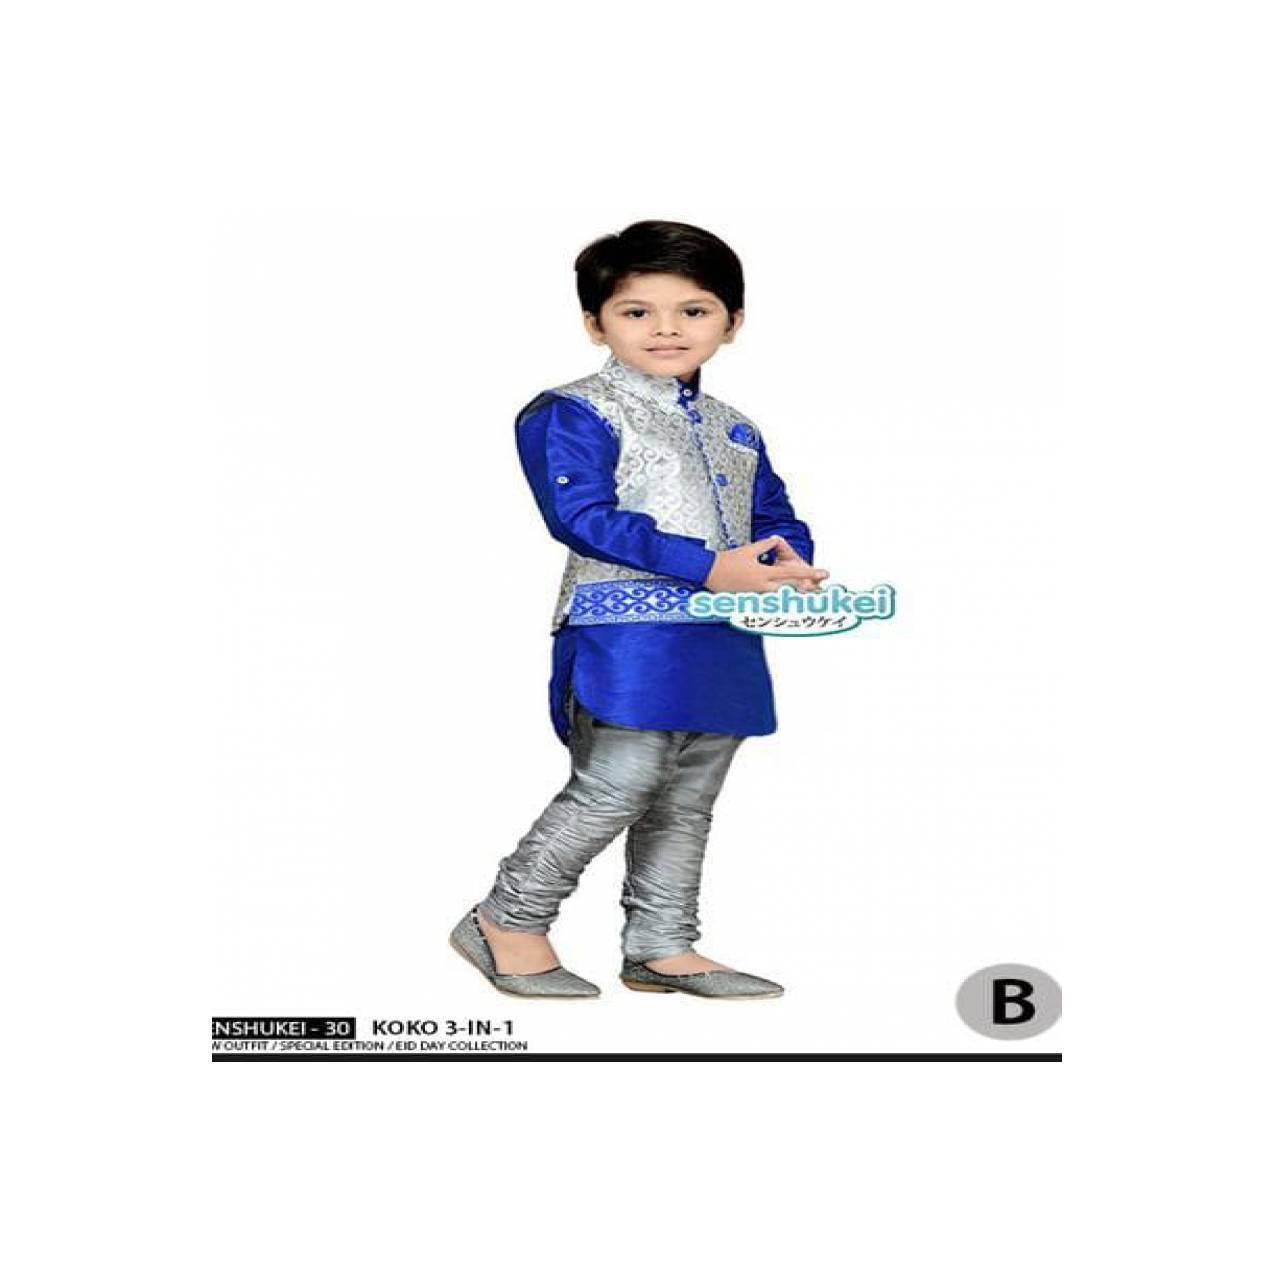 Senshukei 30B Kecil Baju Koko Anak Rompi Biru Silver India Import